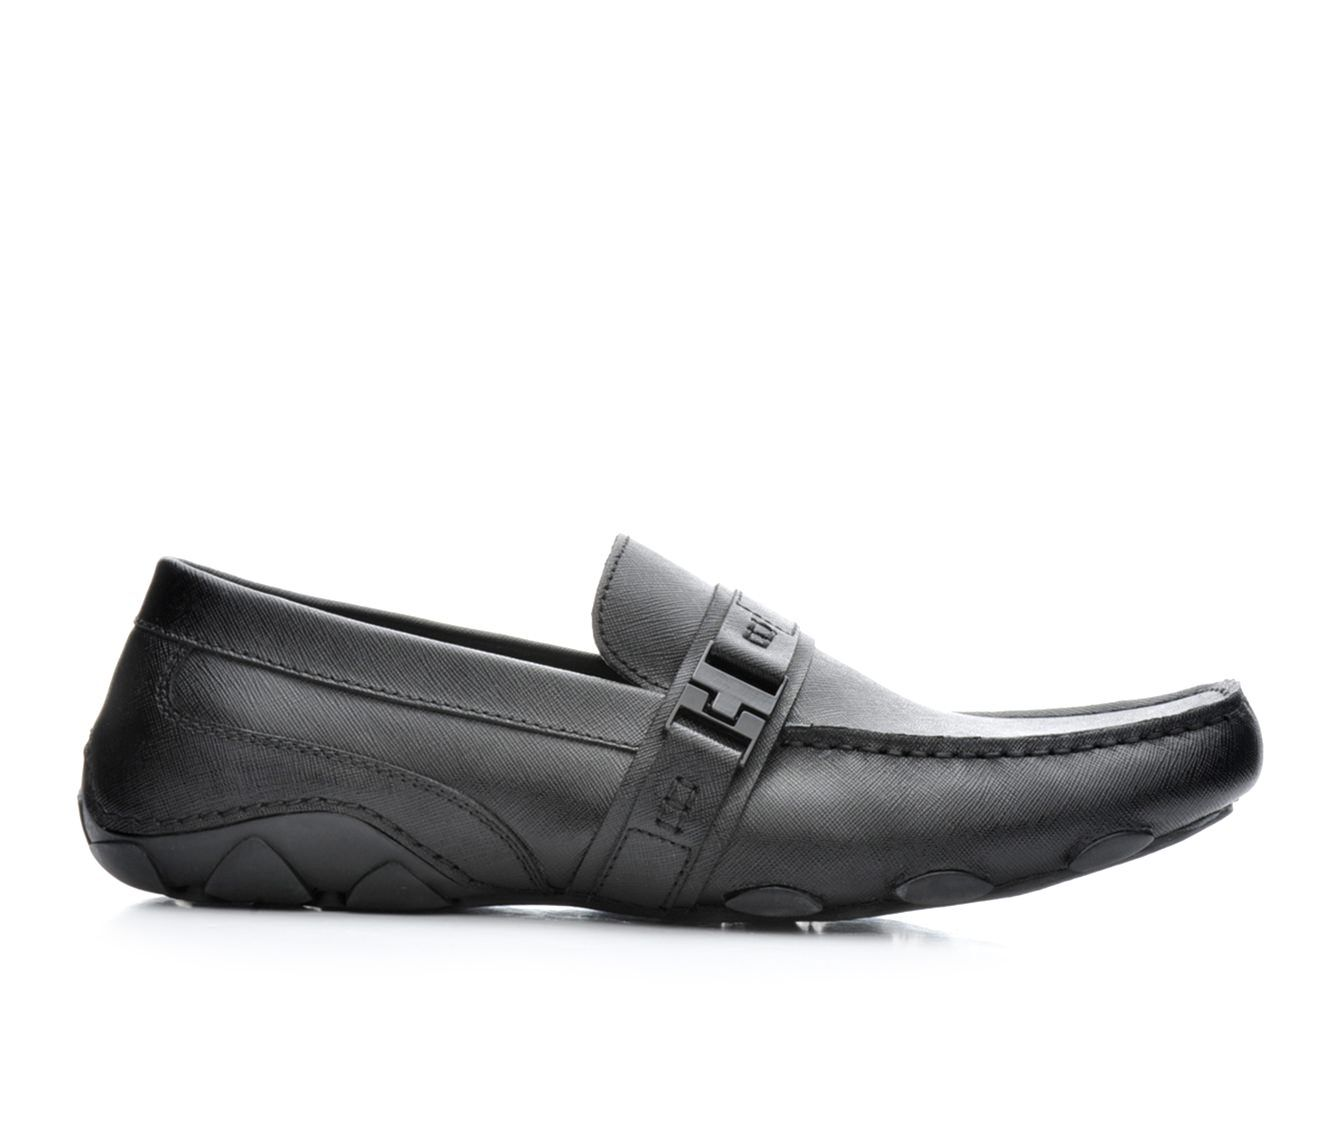 uk shoes_kd1733